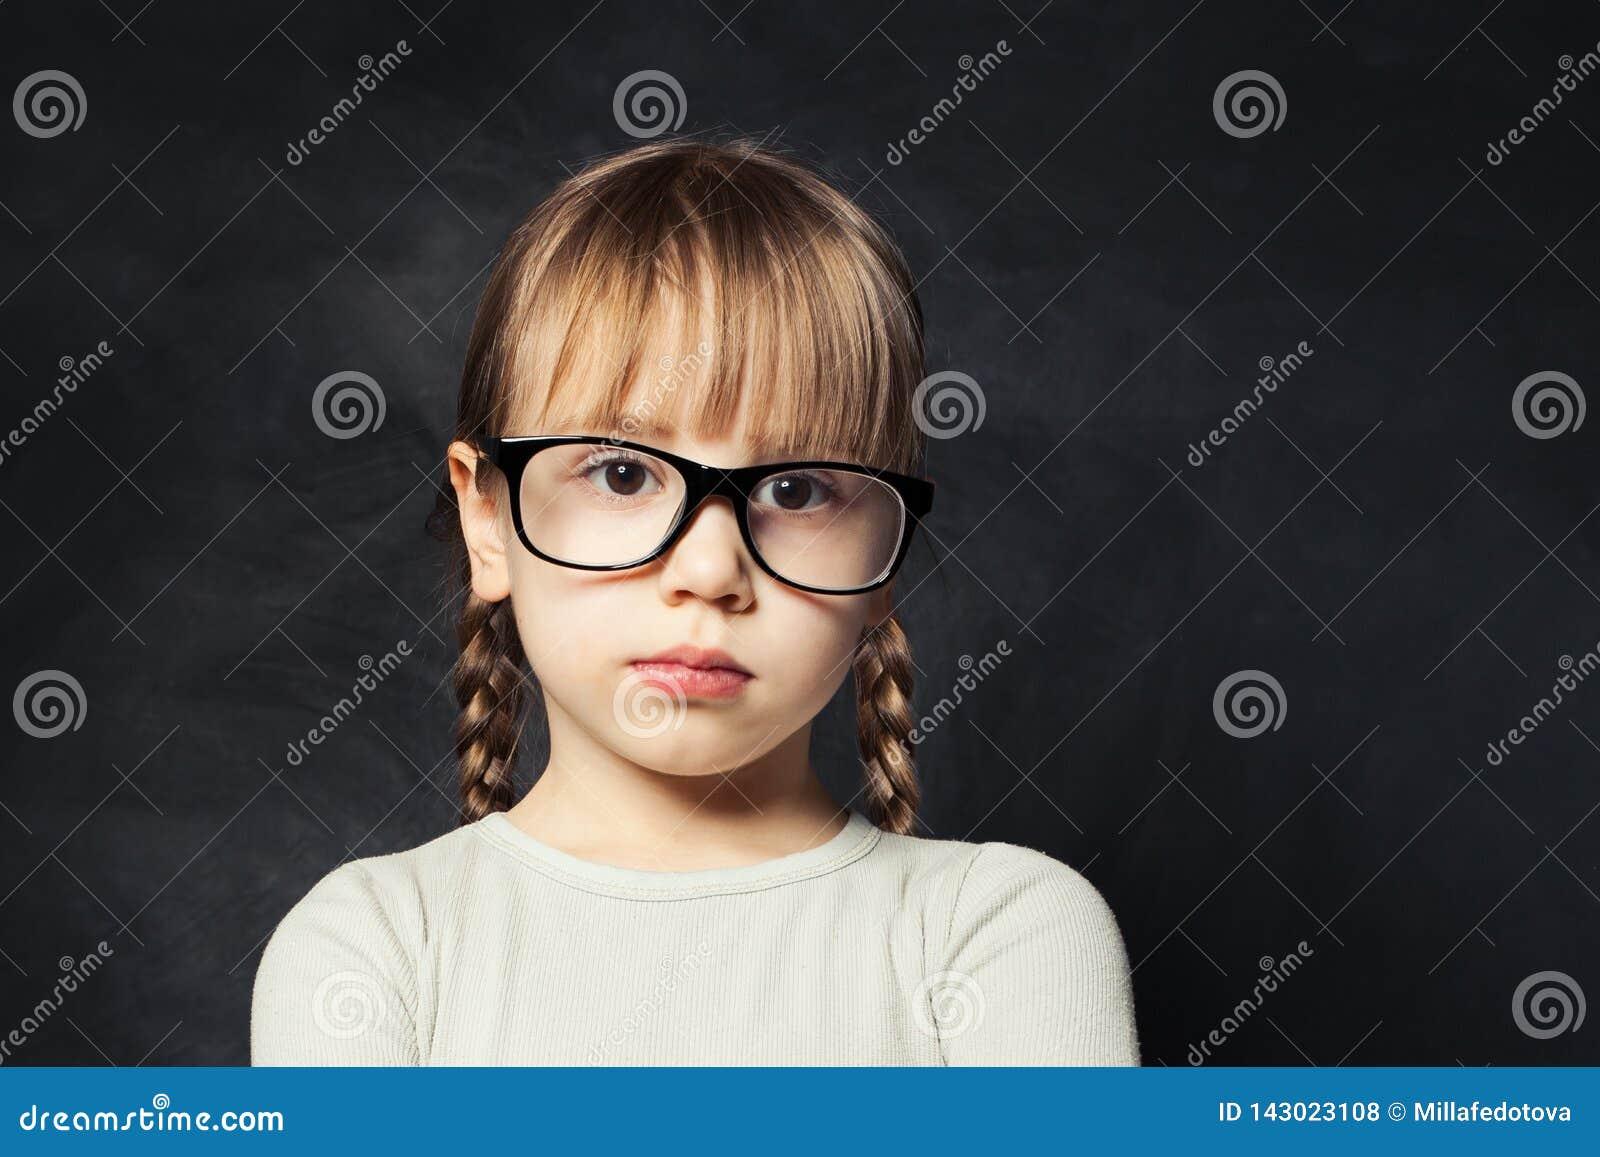 Closeup portrait of pensive child. Cute kid girl on school classroom background